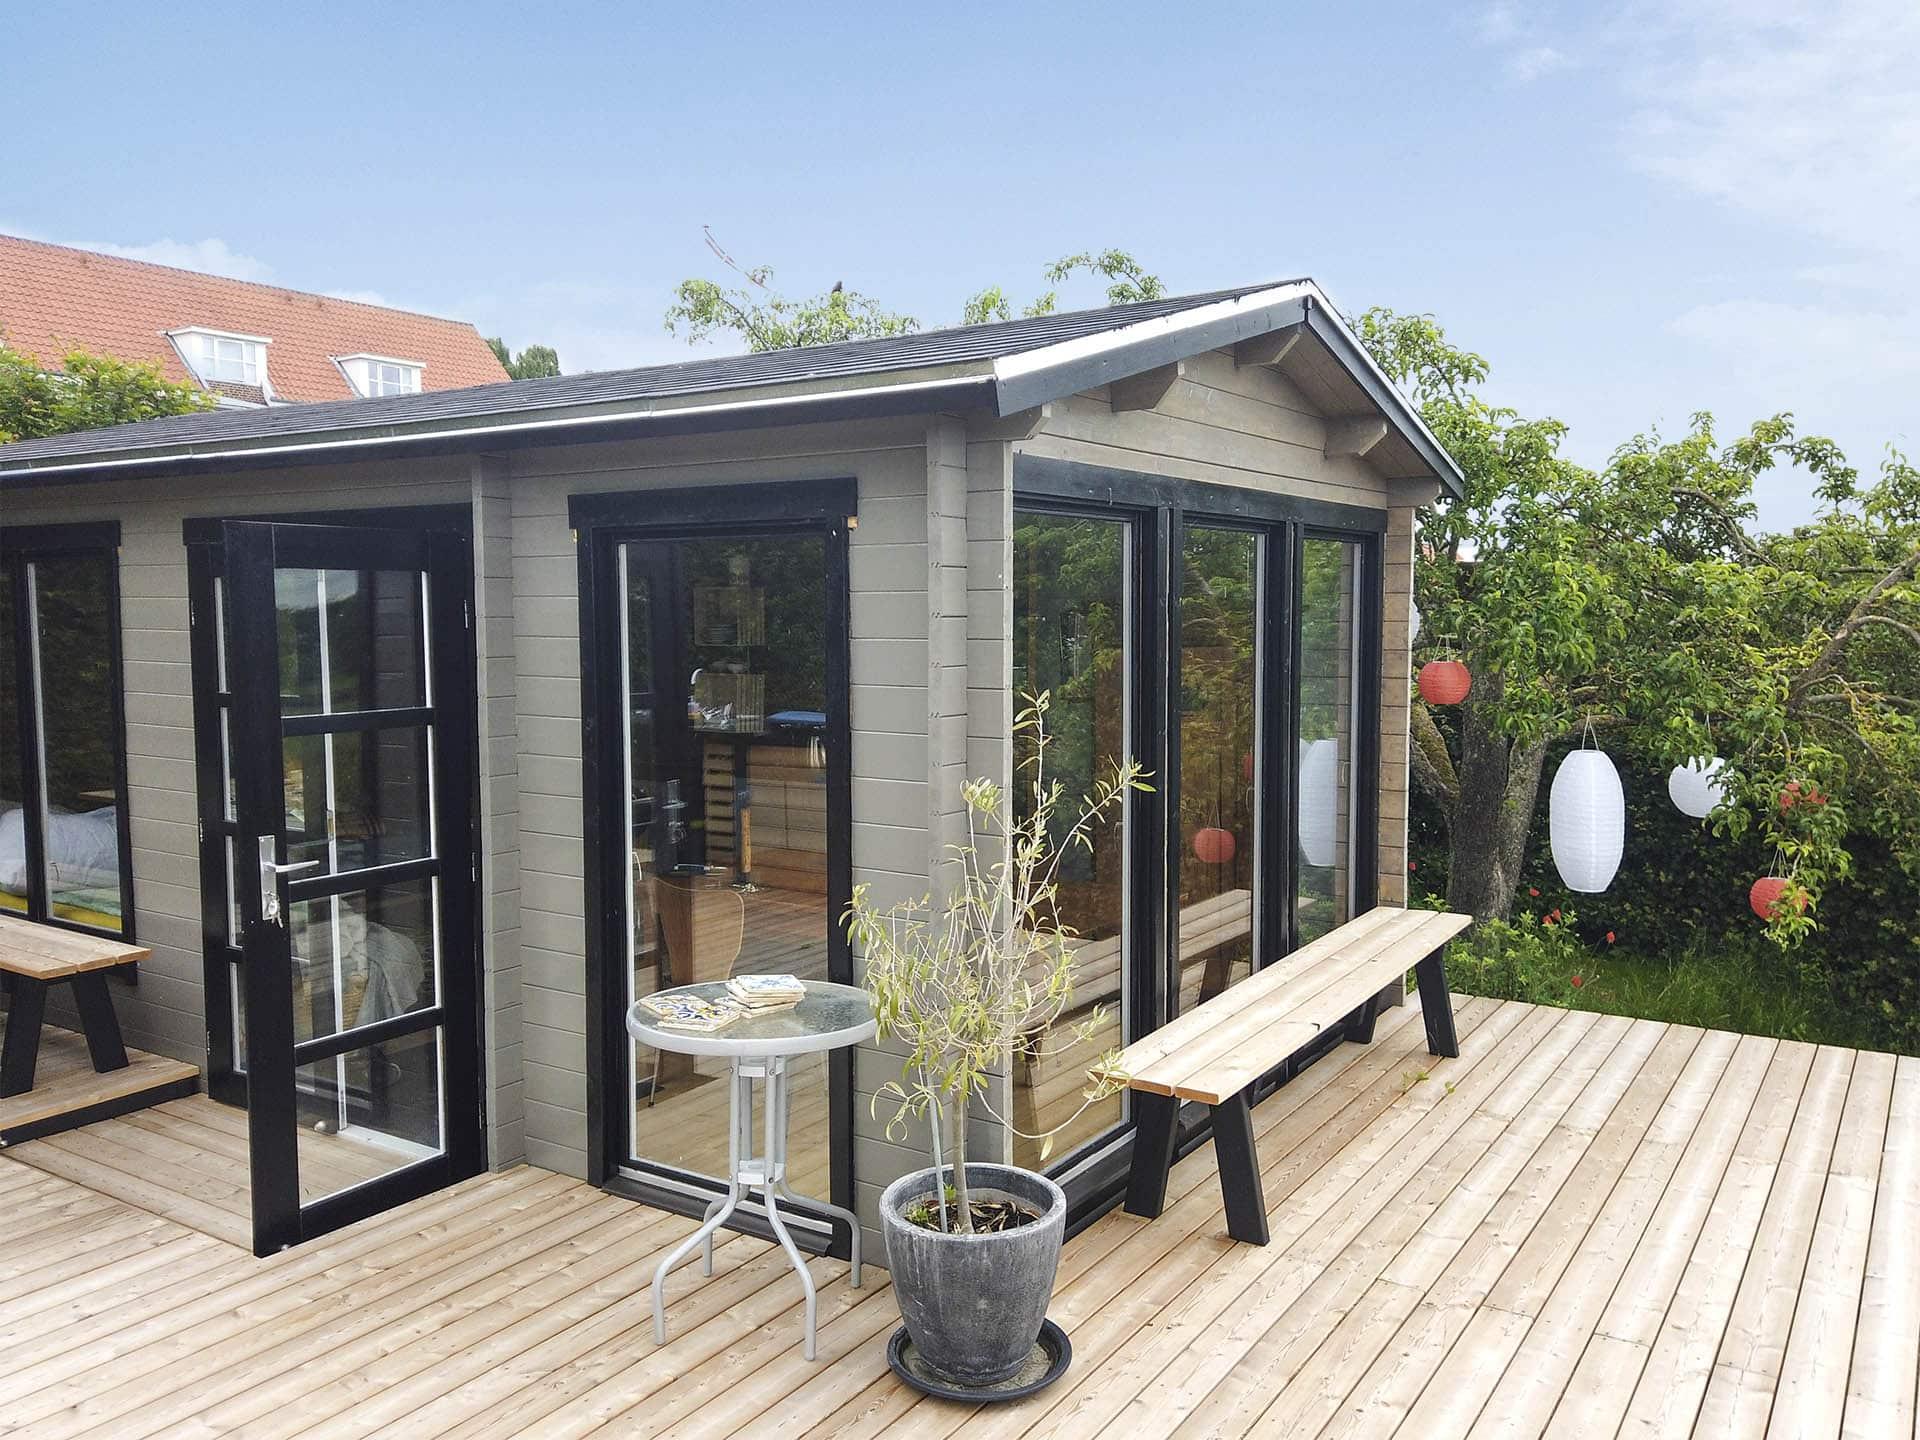 Luna kolonihavehus med orangeri til byg selv fra www.sølundhuse.dk b